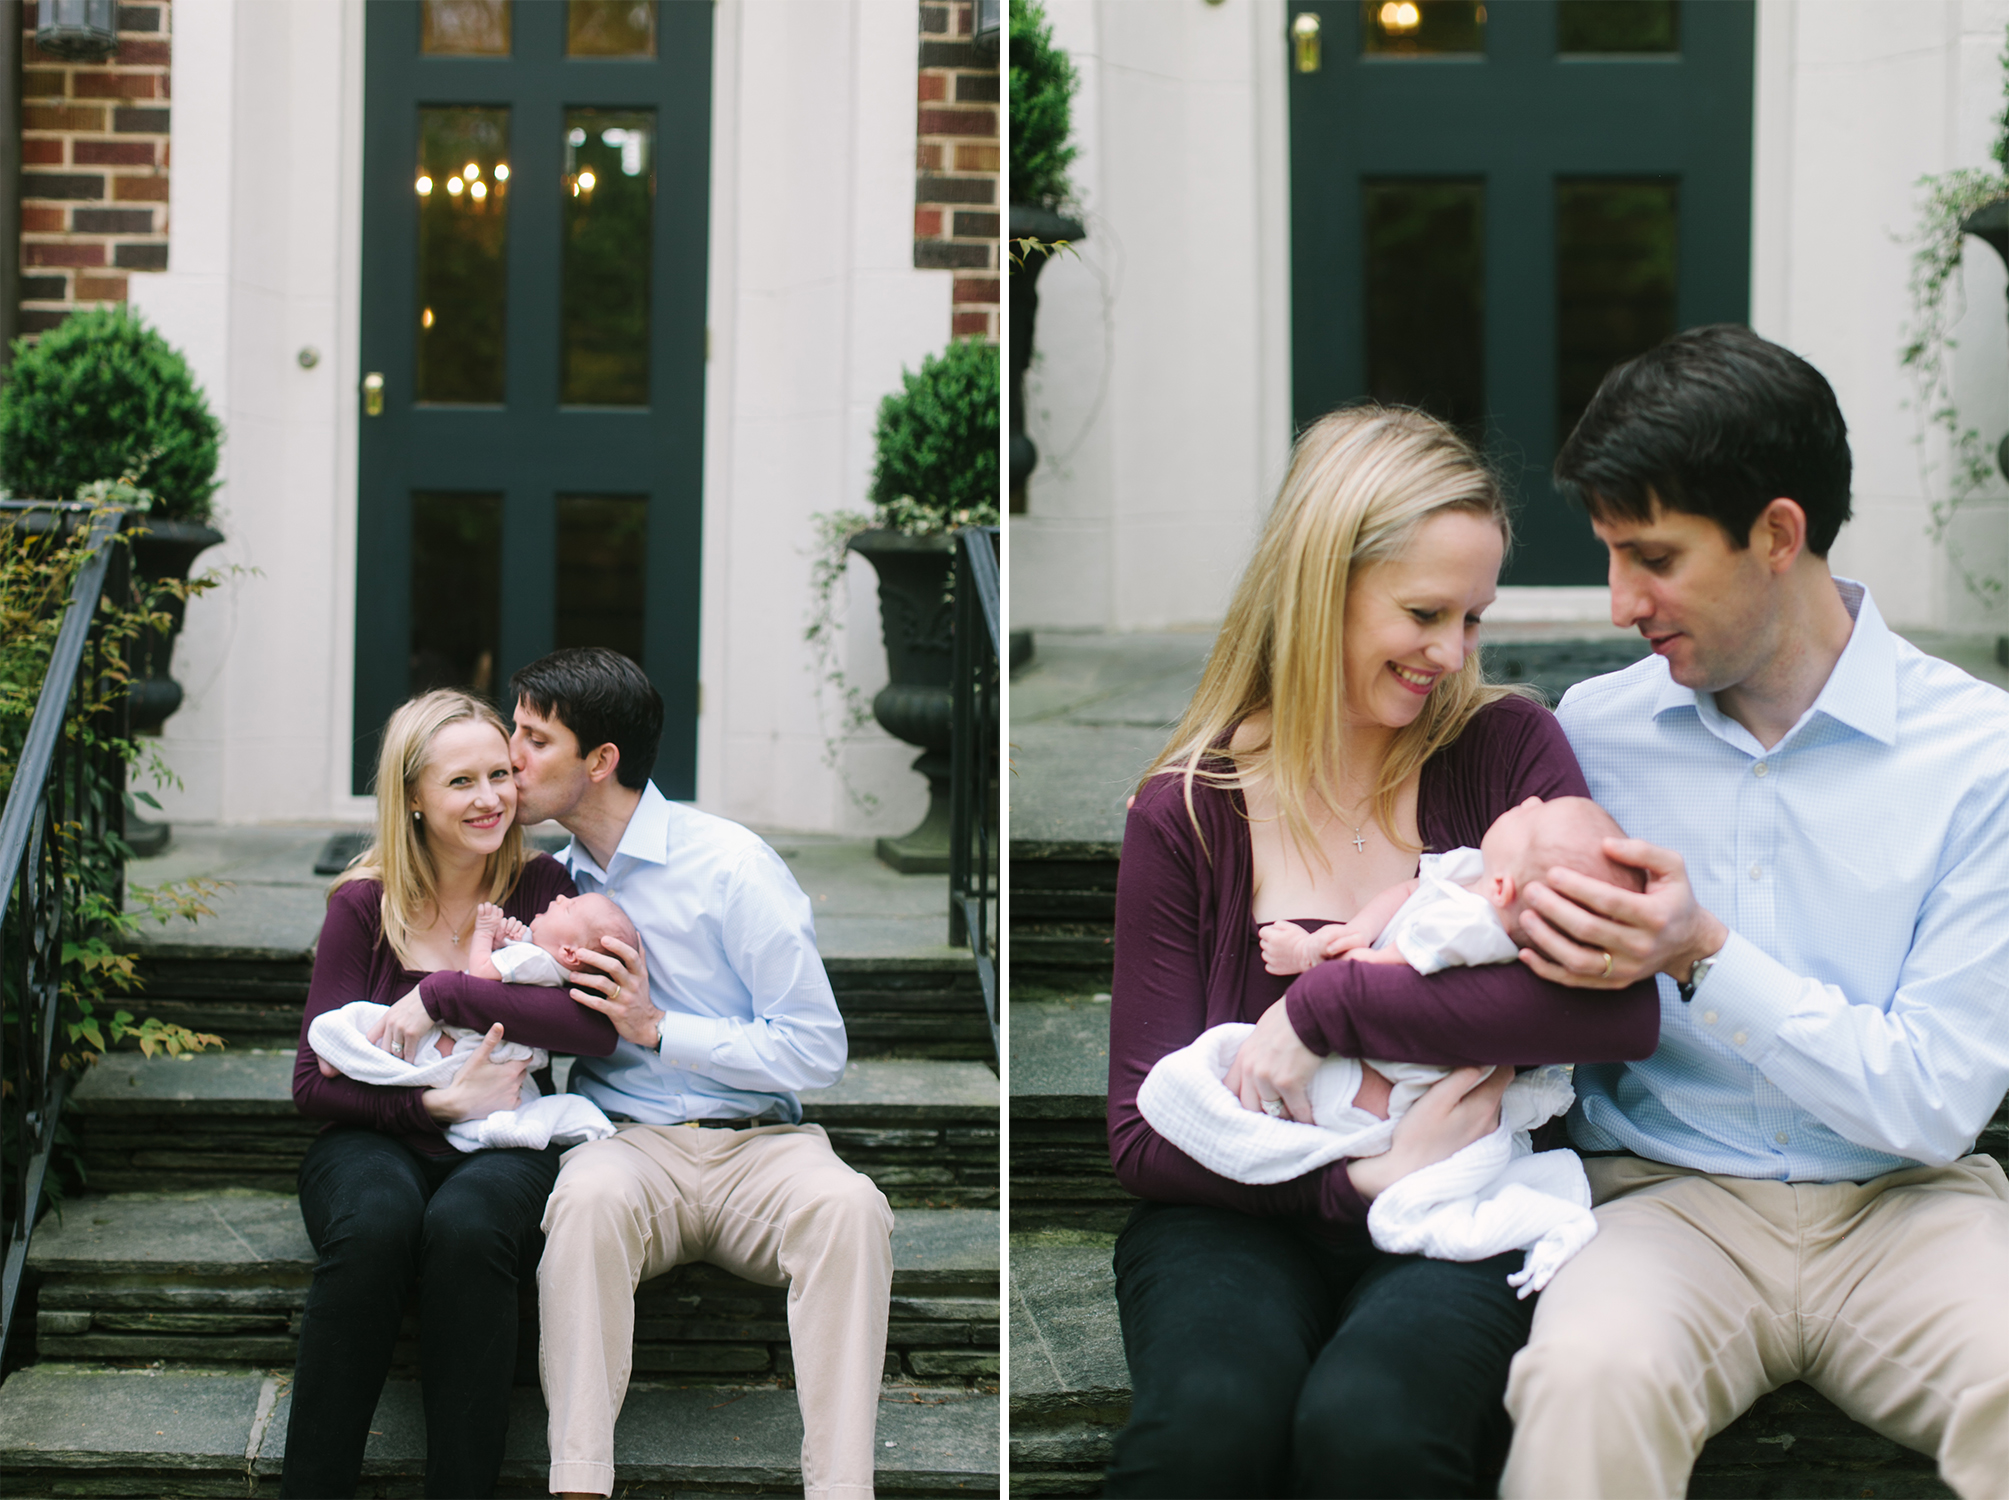 Kathryn-McCrary-Photography-Atlanta-Newborn-Photography-Collage-7.jpg